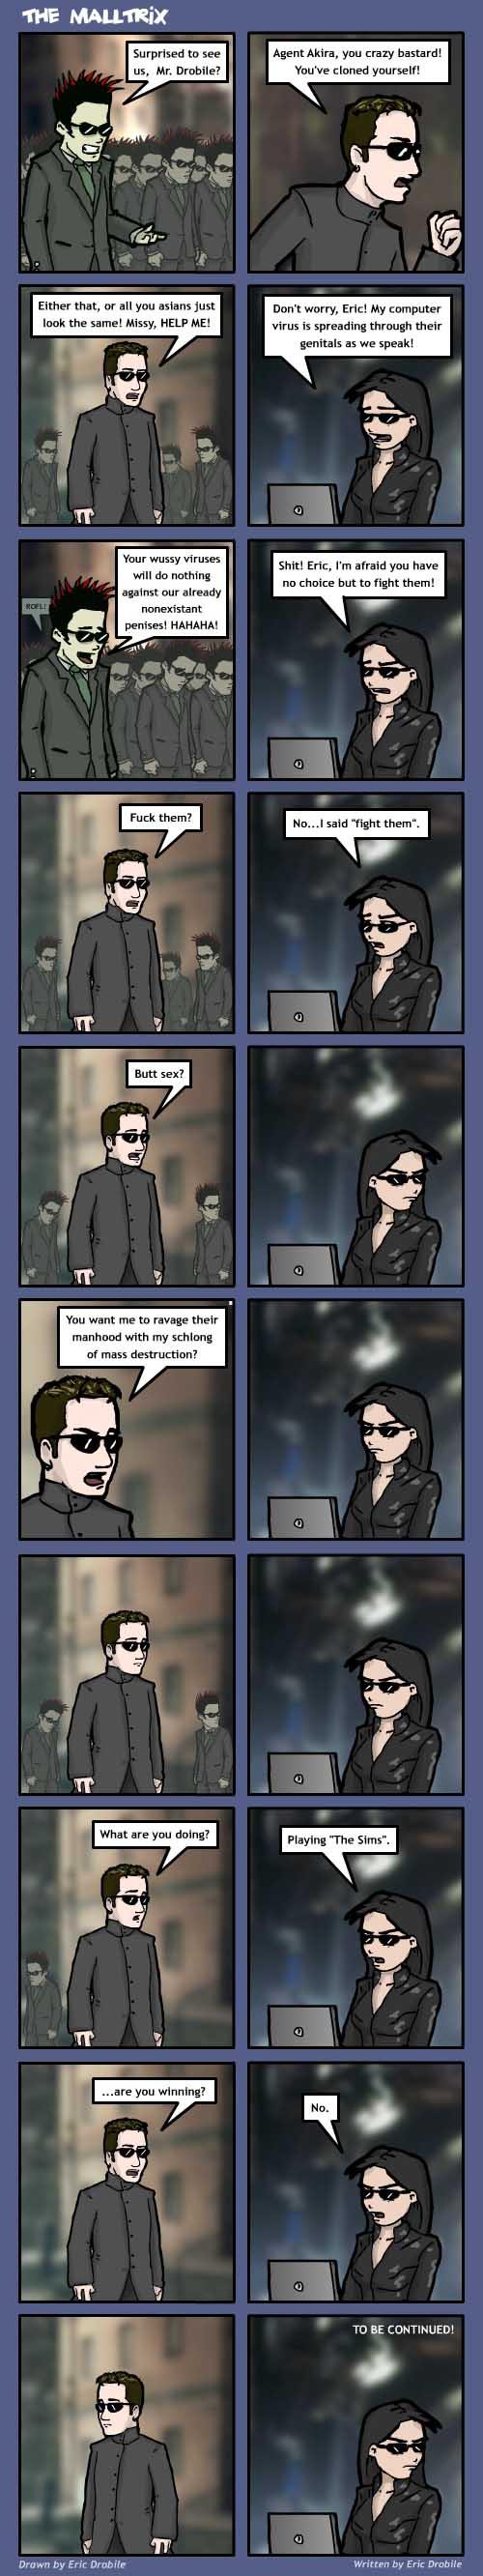 Mall Monkeys Comic - The Malltrix Part 1